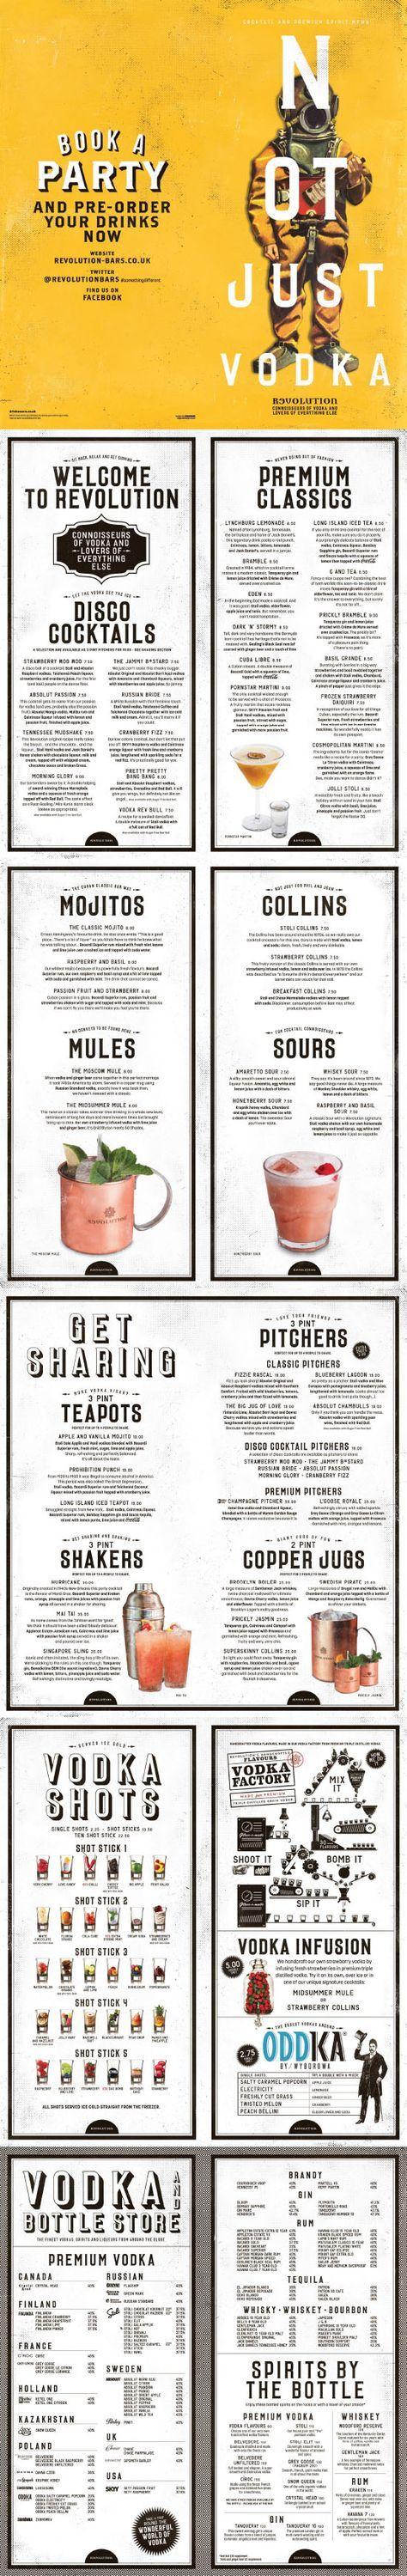 Cool Retro Bar Menu, Graphic Design, Typography, Illustration, Photography for Vodka Revolution by www.diagramdesign.co.uk